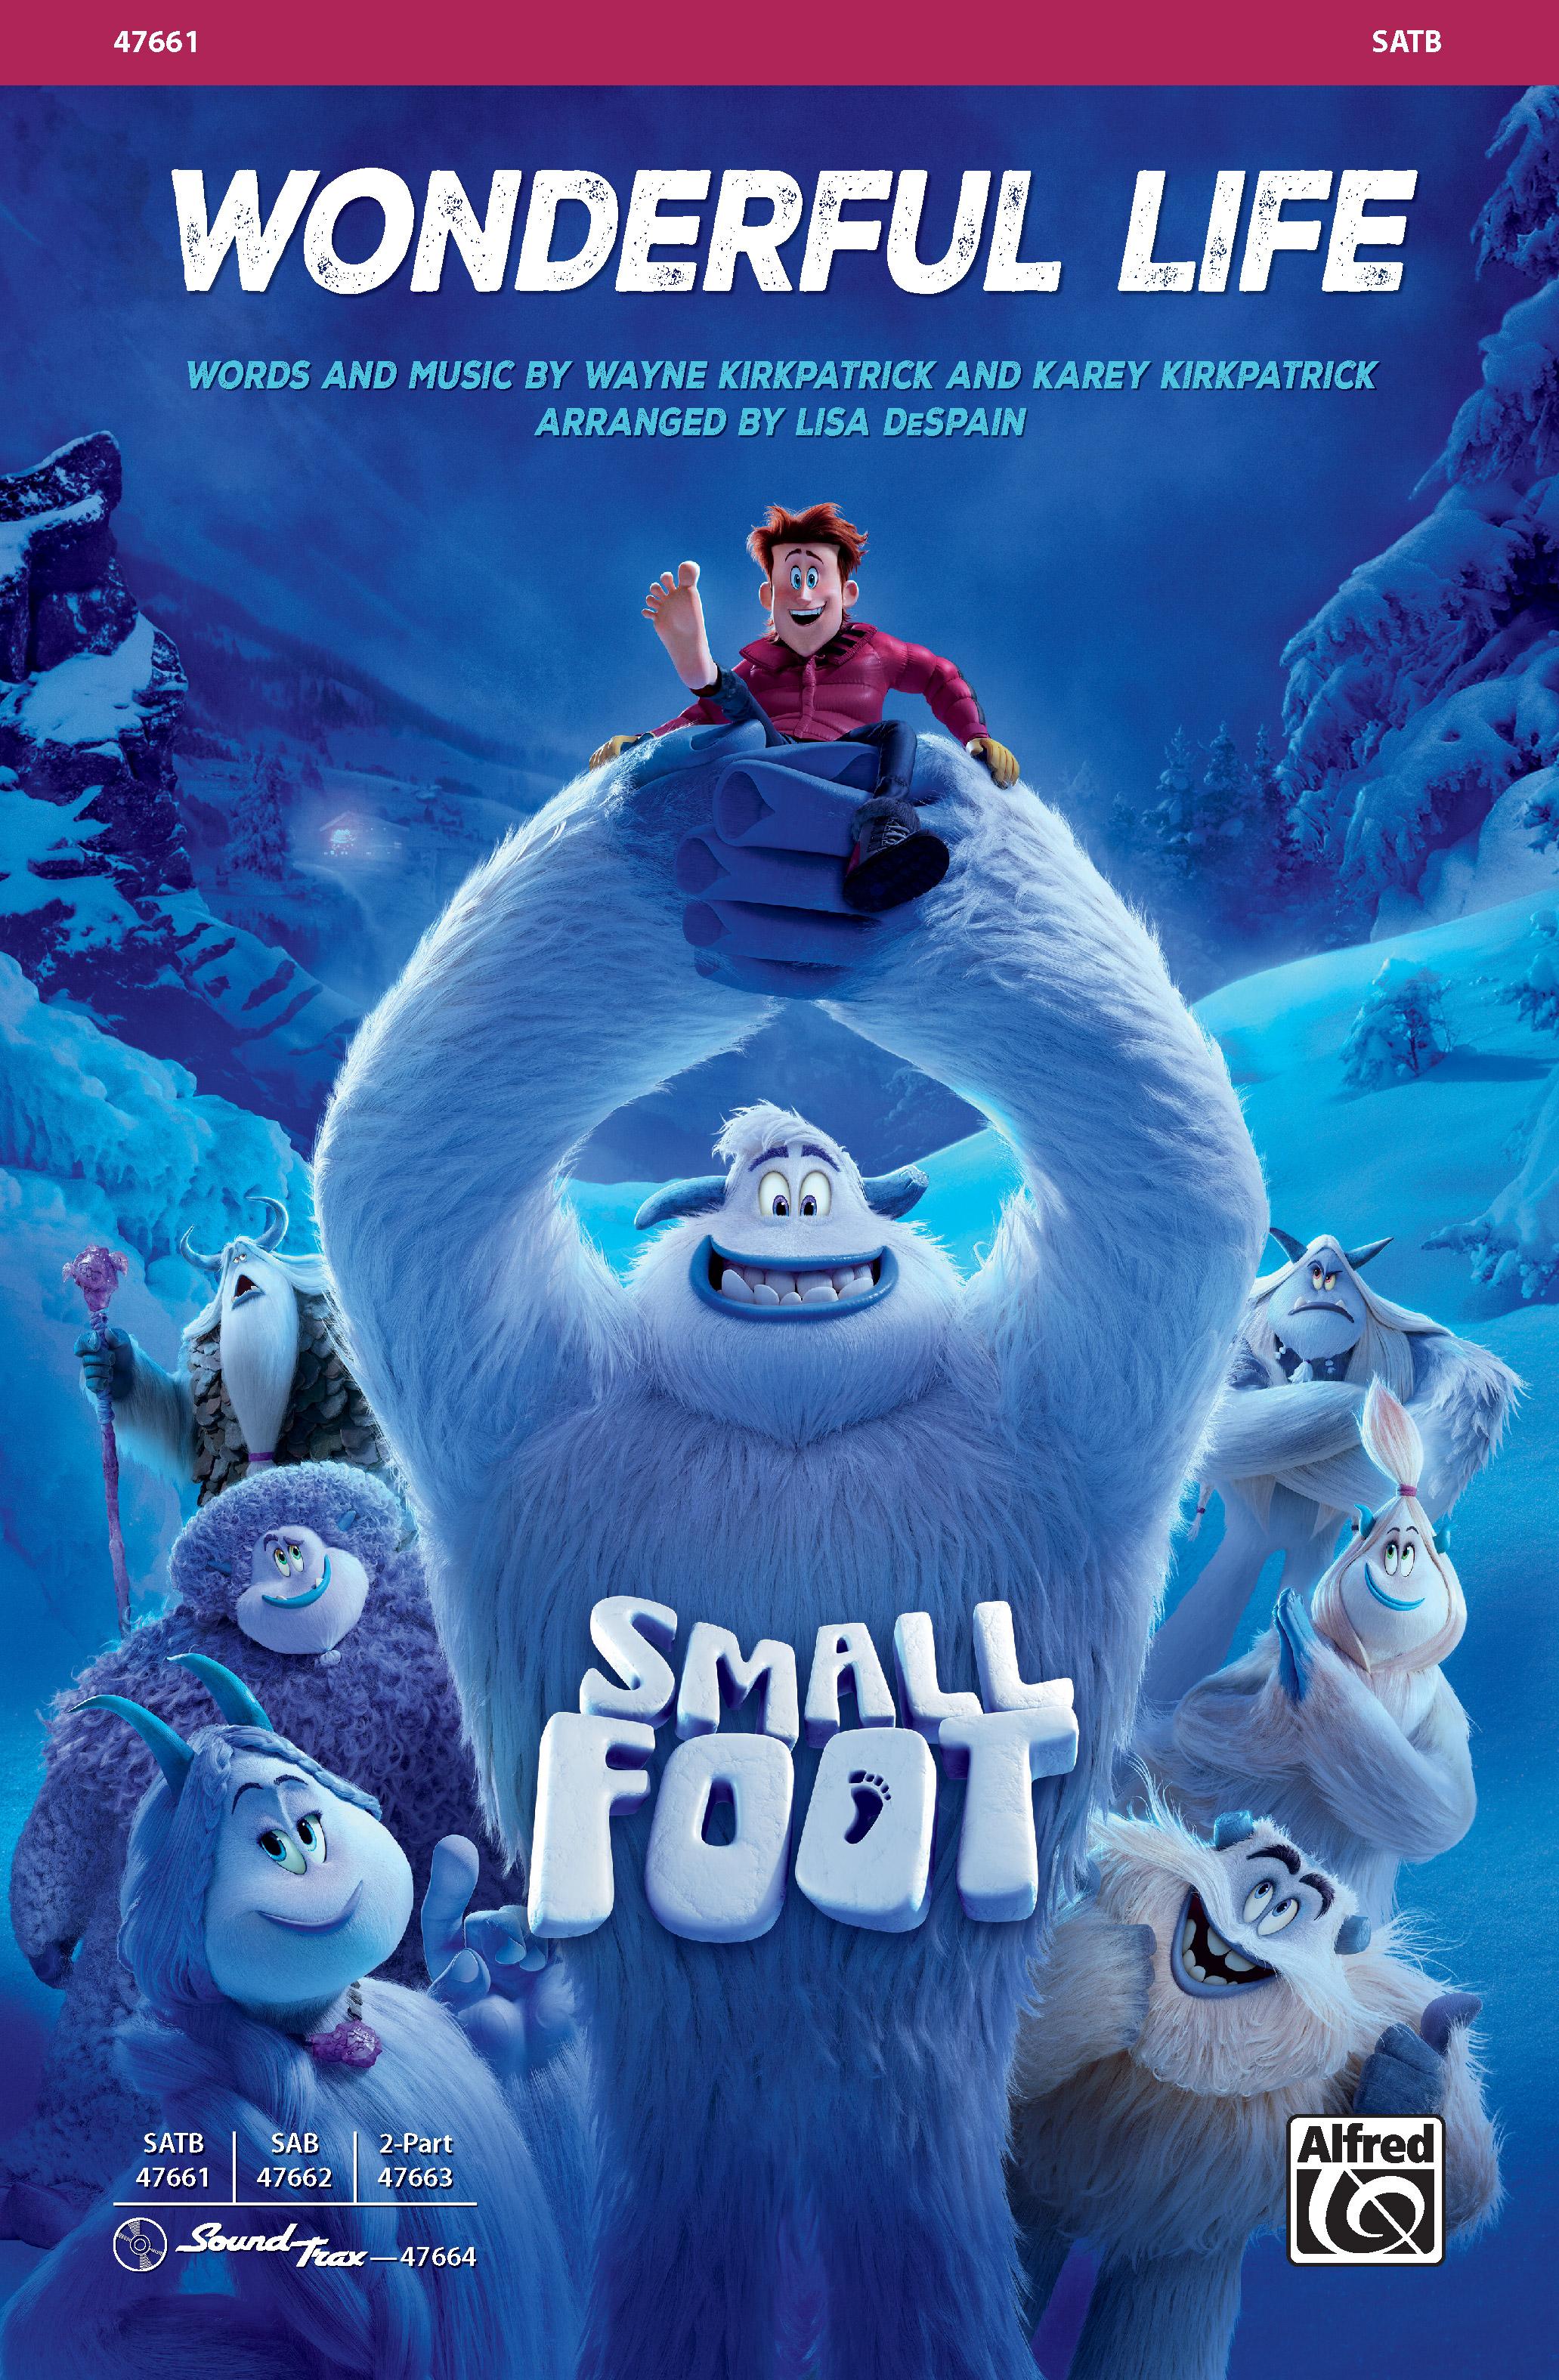 Wonderful Life : SATB : Lisa DeSpain : Smallfoot : Sheet Music : 00-47661 : 038081543543